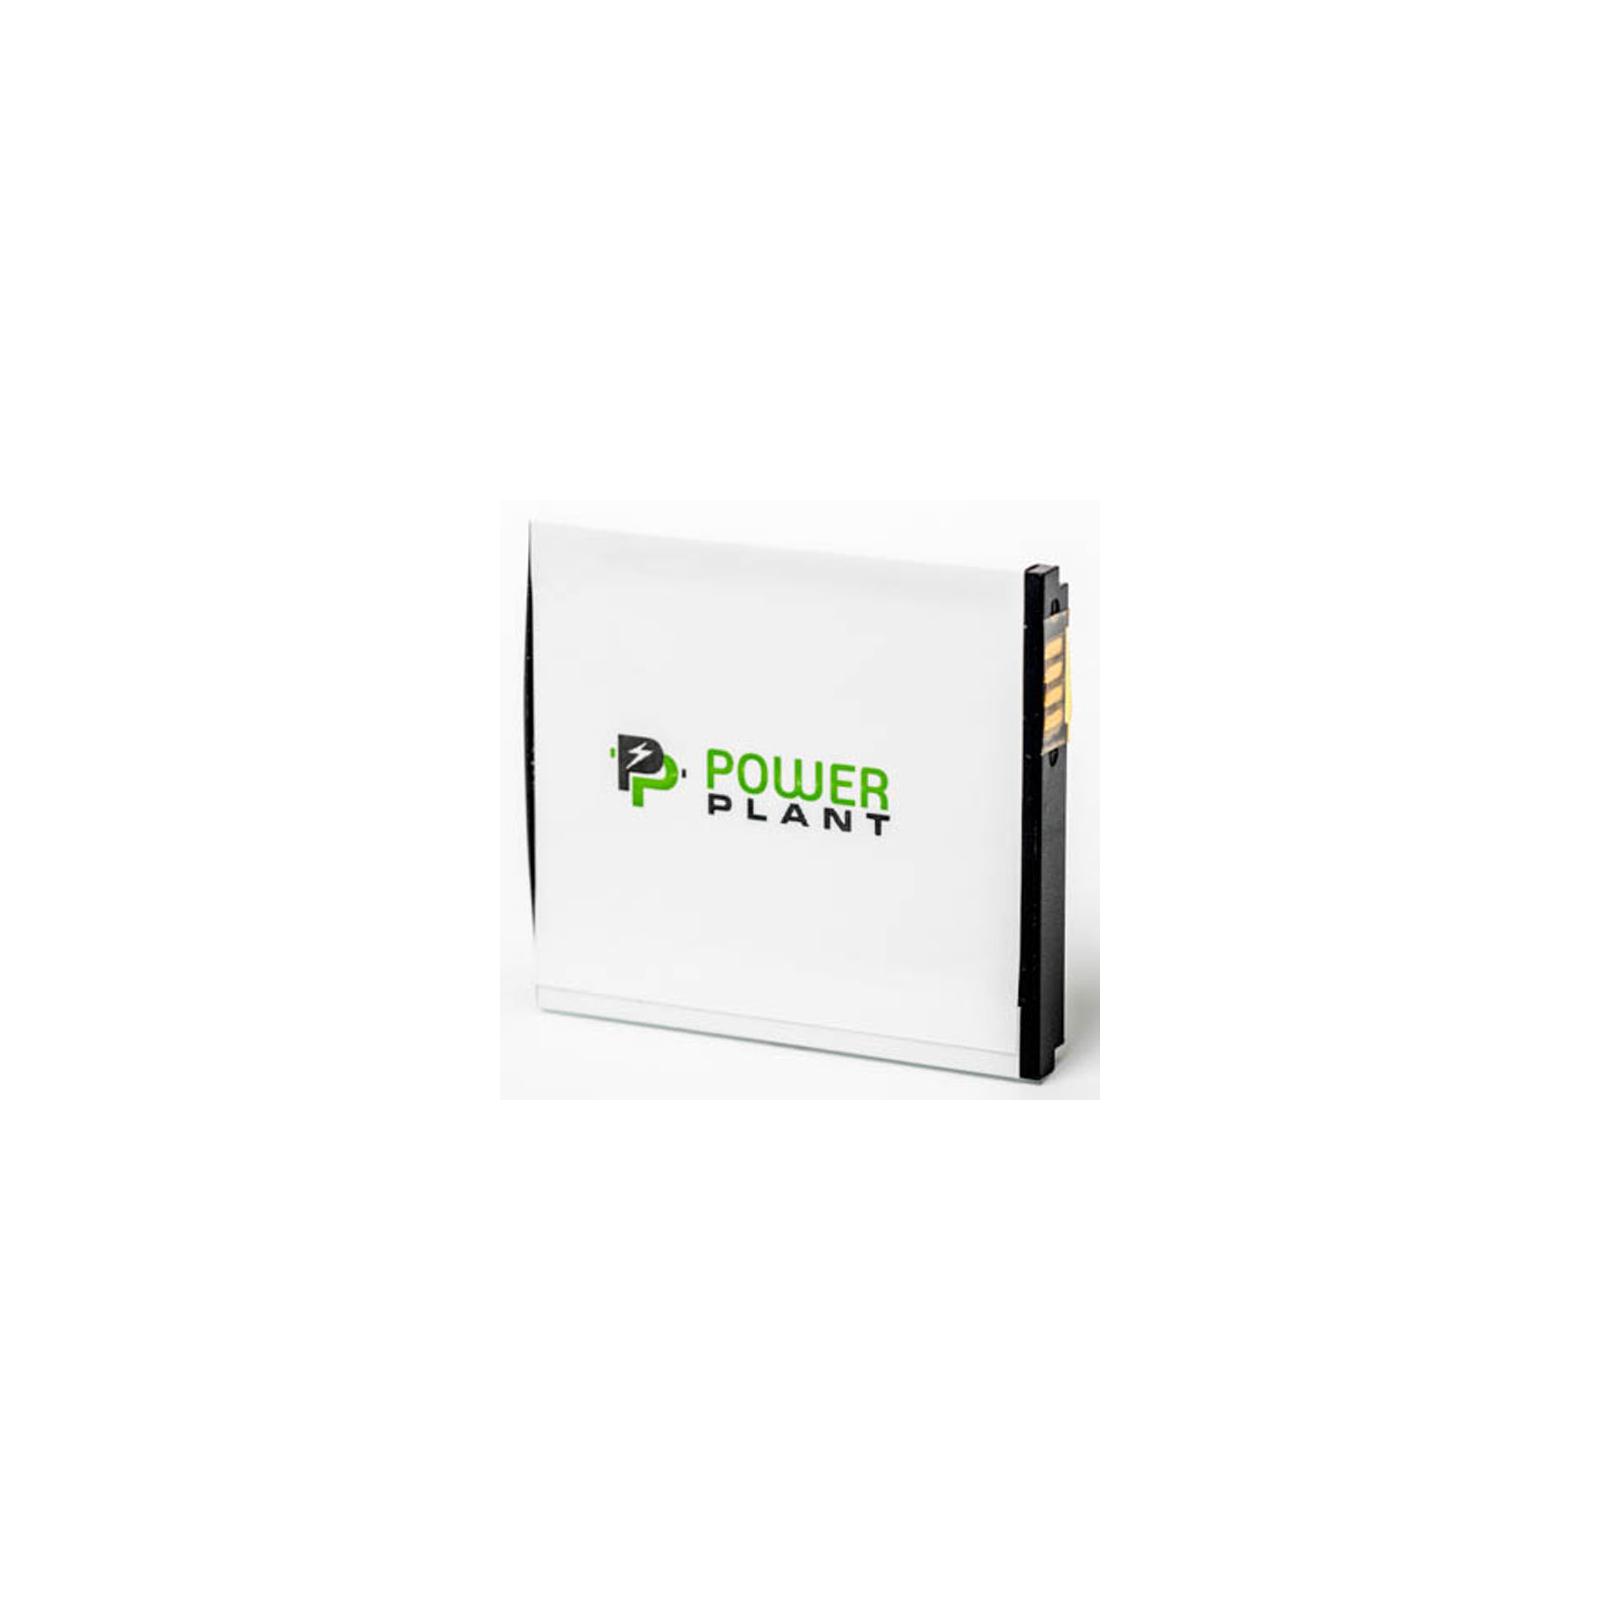 Аккумуляторная батарея PowerPlant Motorola BP6X (DROID A855, ME501, XT701, XT311) (DV00DV6133) изображение 2